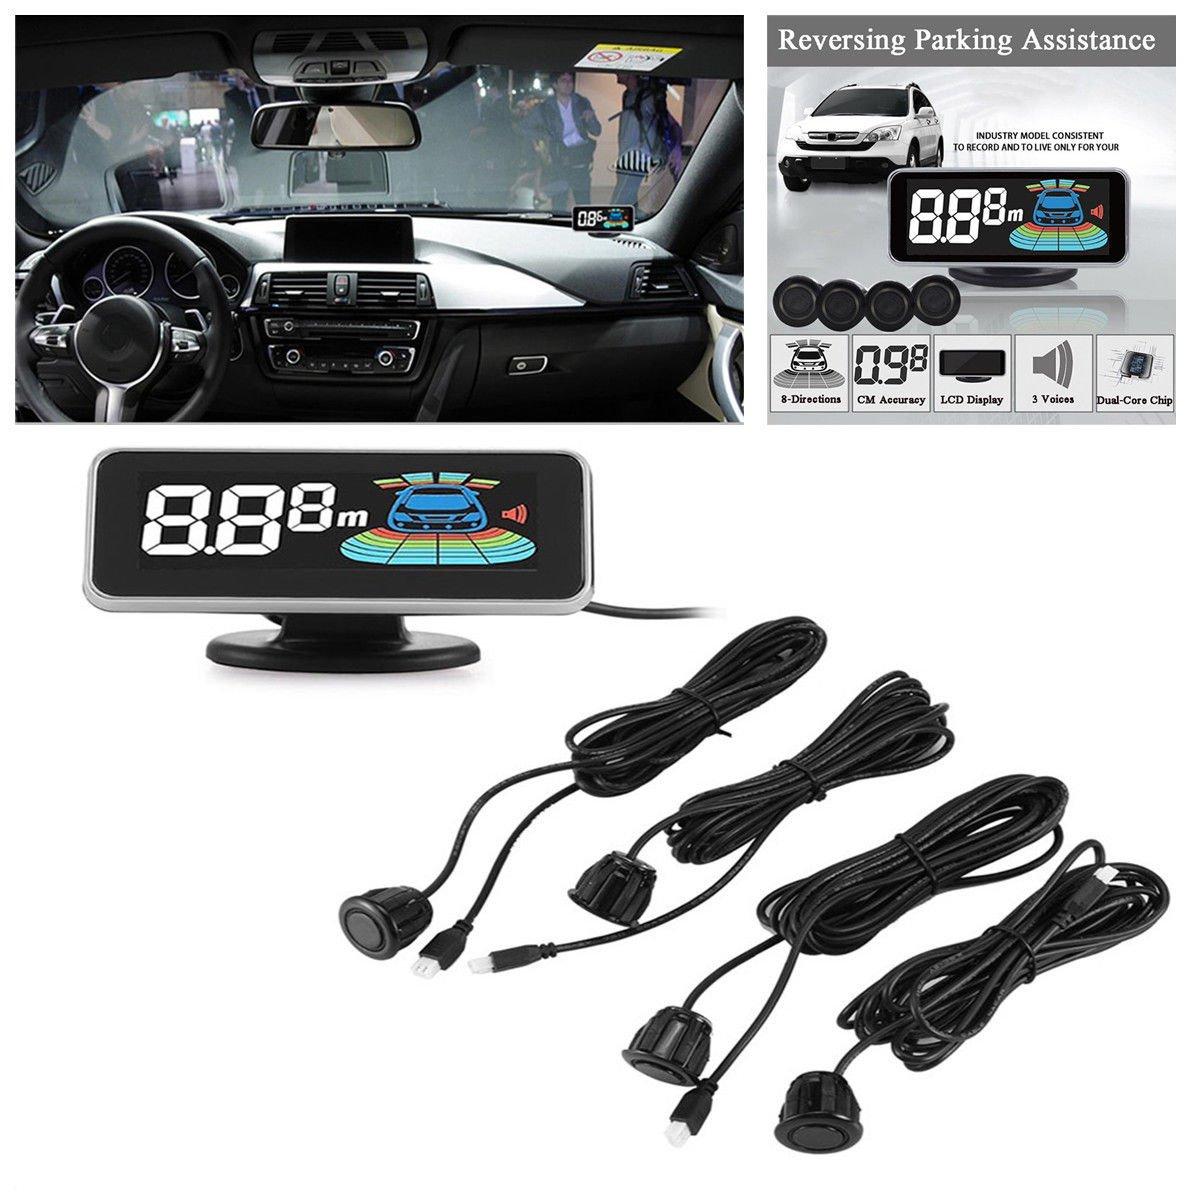 LCD Display Car Parking Sensor Rear Front View Reverse Radar Alert Alarm System